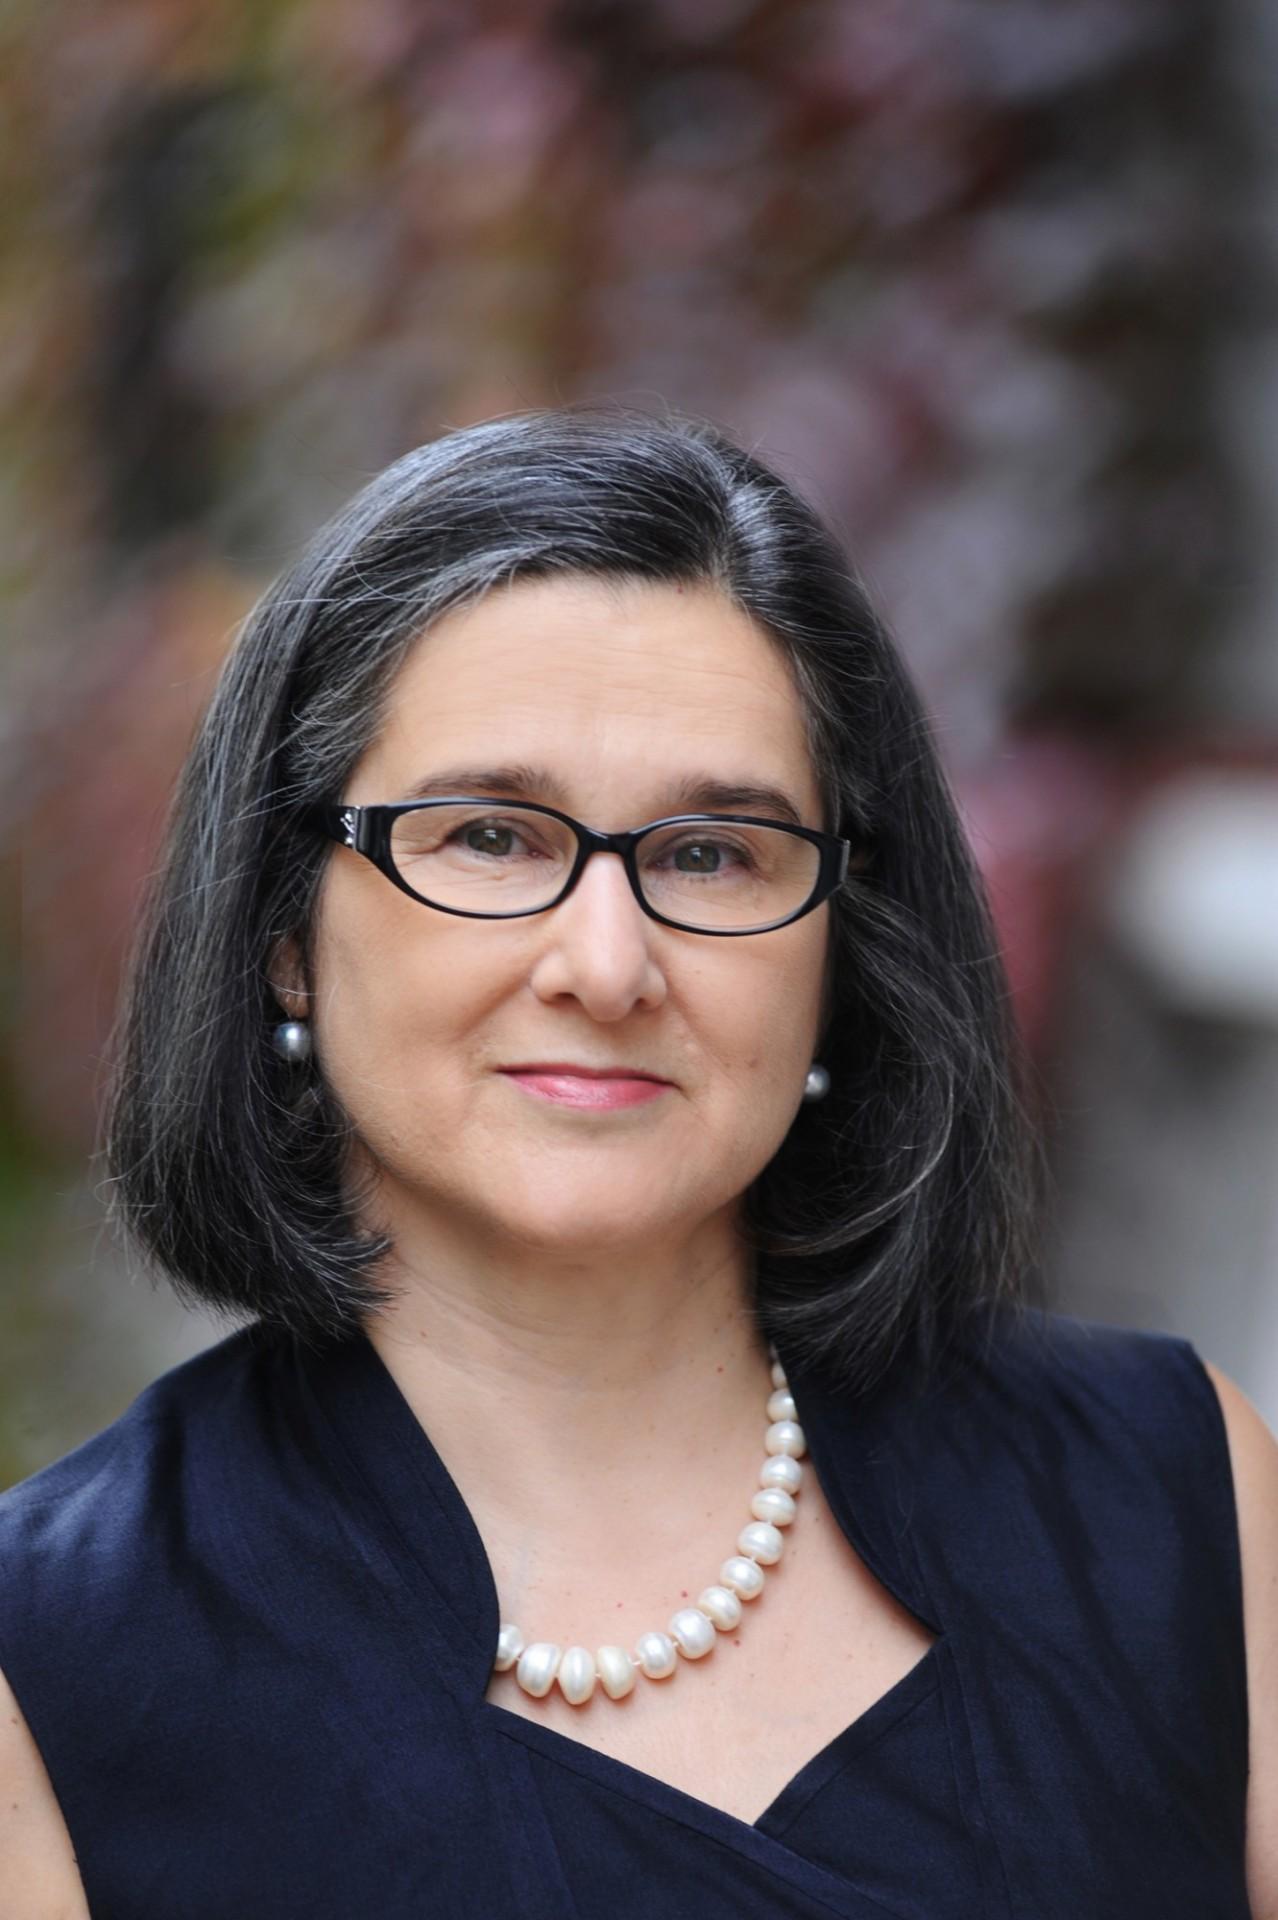 photo of Teodolinda Barolini